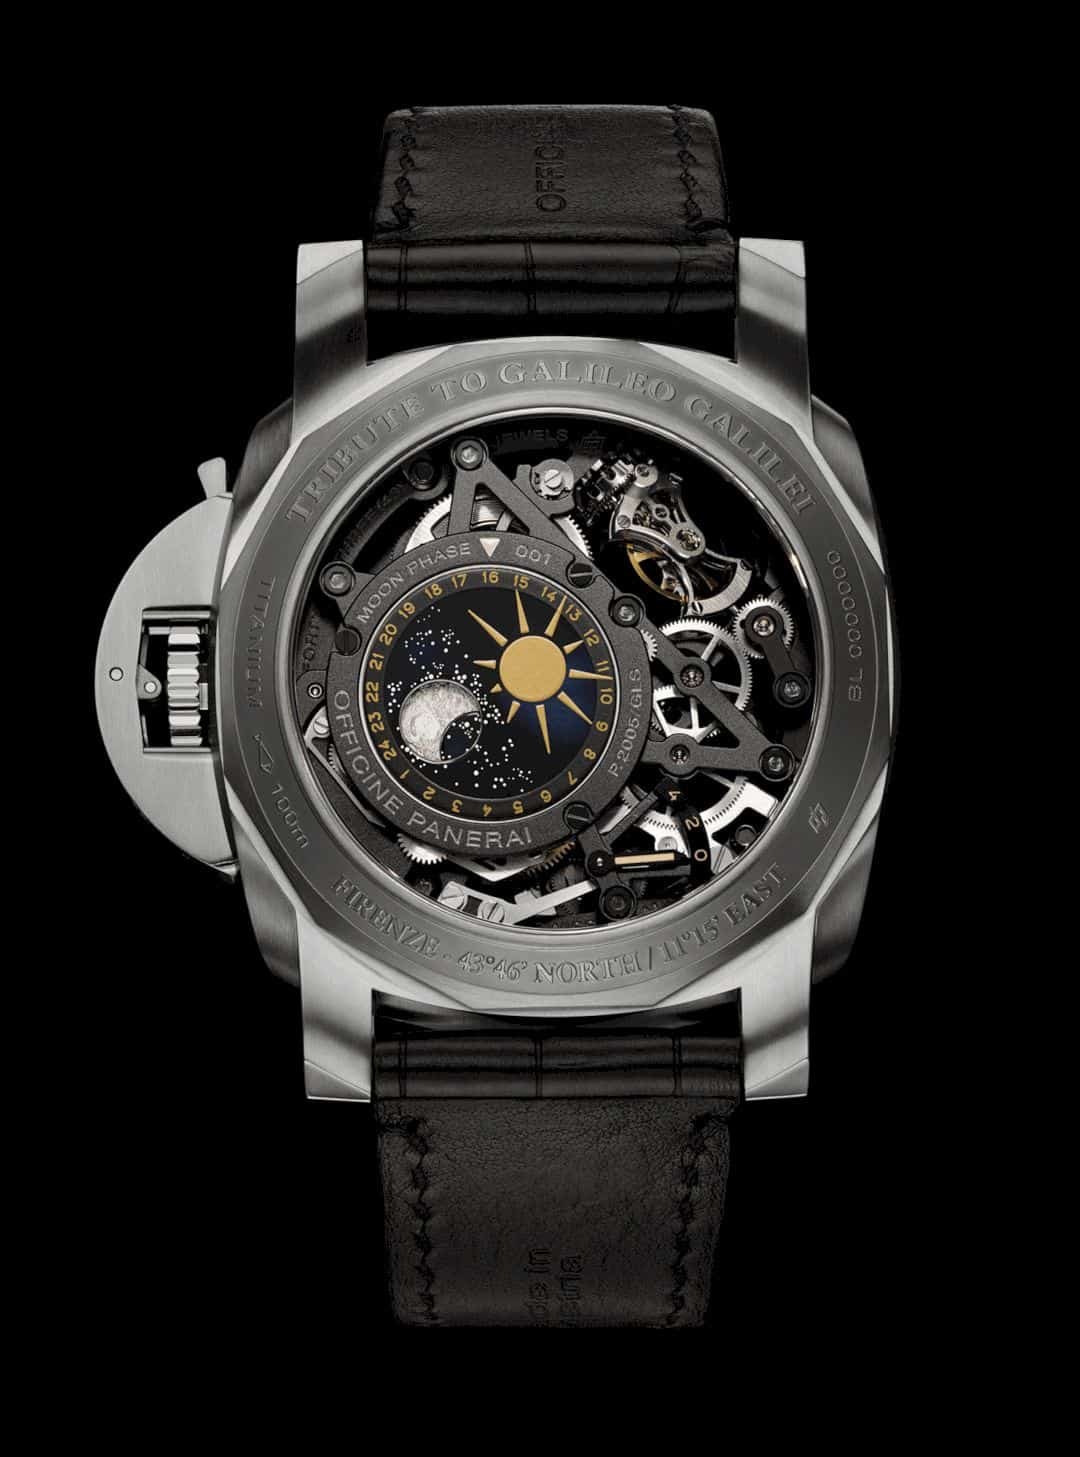 L'Astronomo Luminor 1950 Tourbillon Watch 8